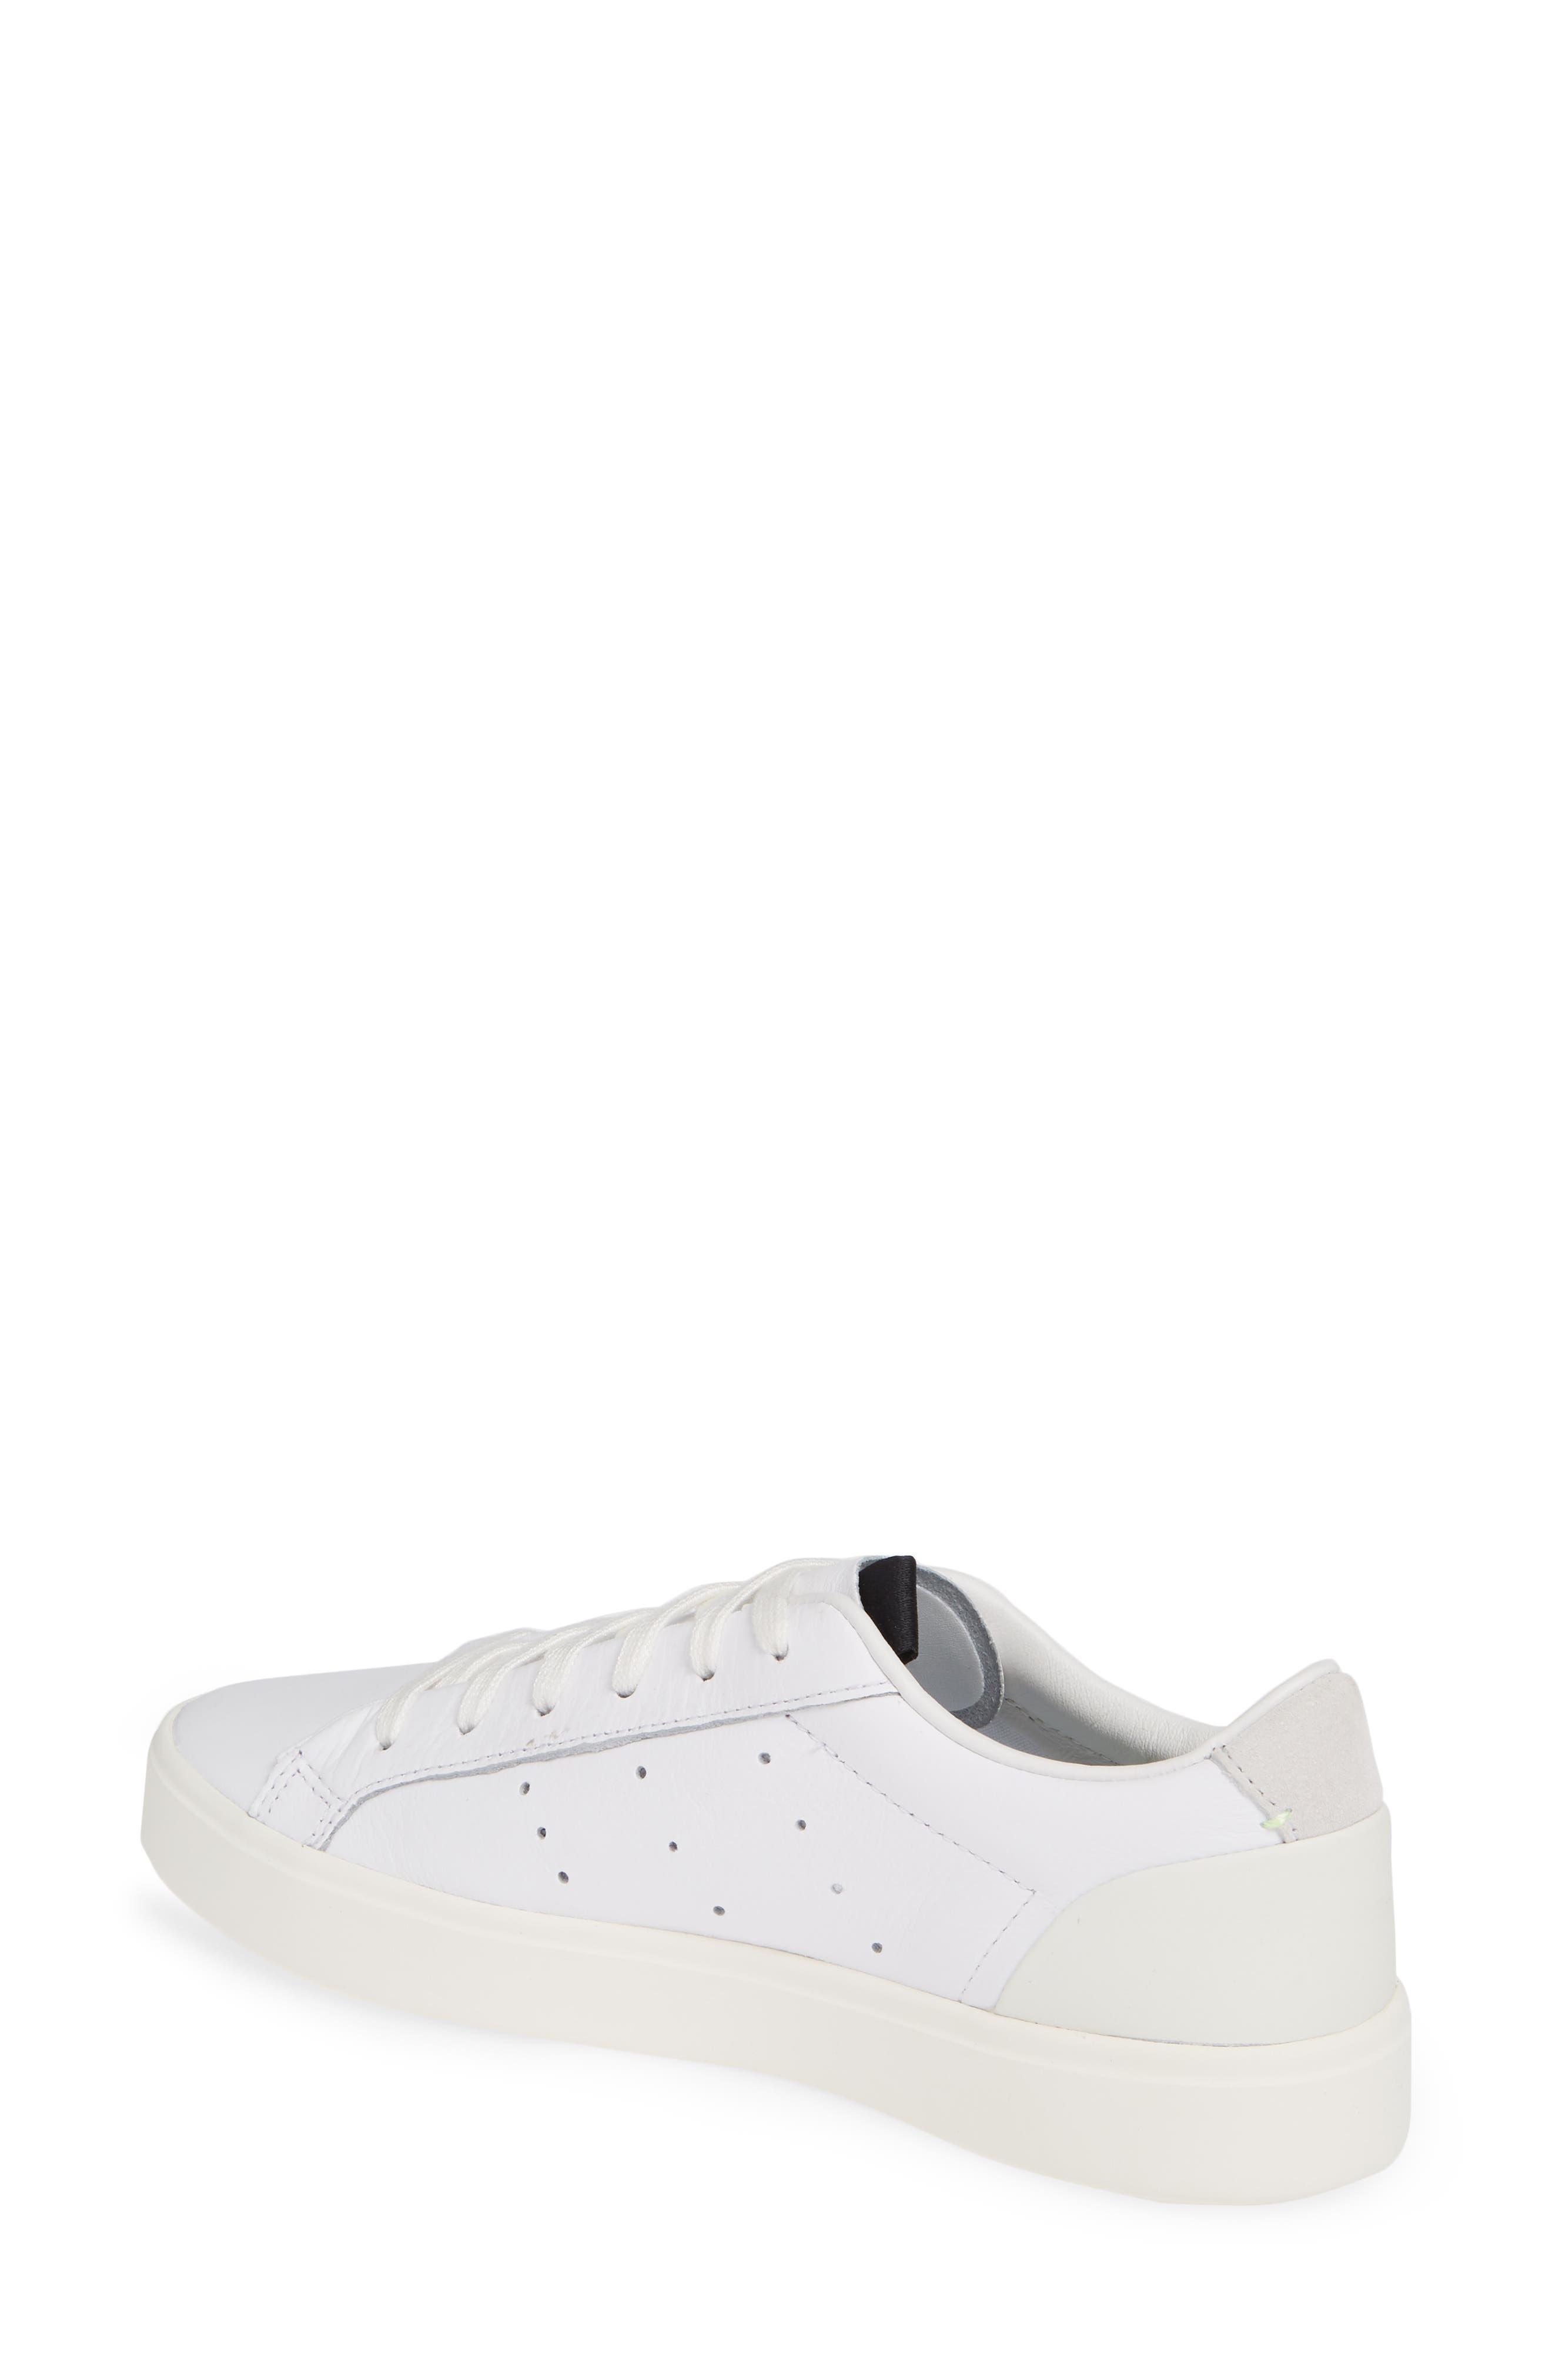 ADIDAS,                             Sleek Leather Sneaker,                             Alternate thumbnail 2, color,                             WHITE/ OFF WHITE/ CRYSTAL